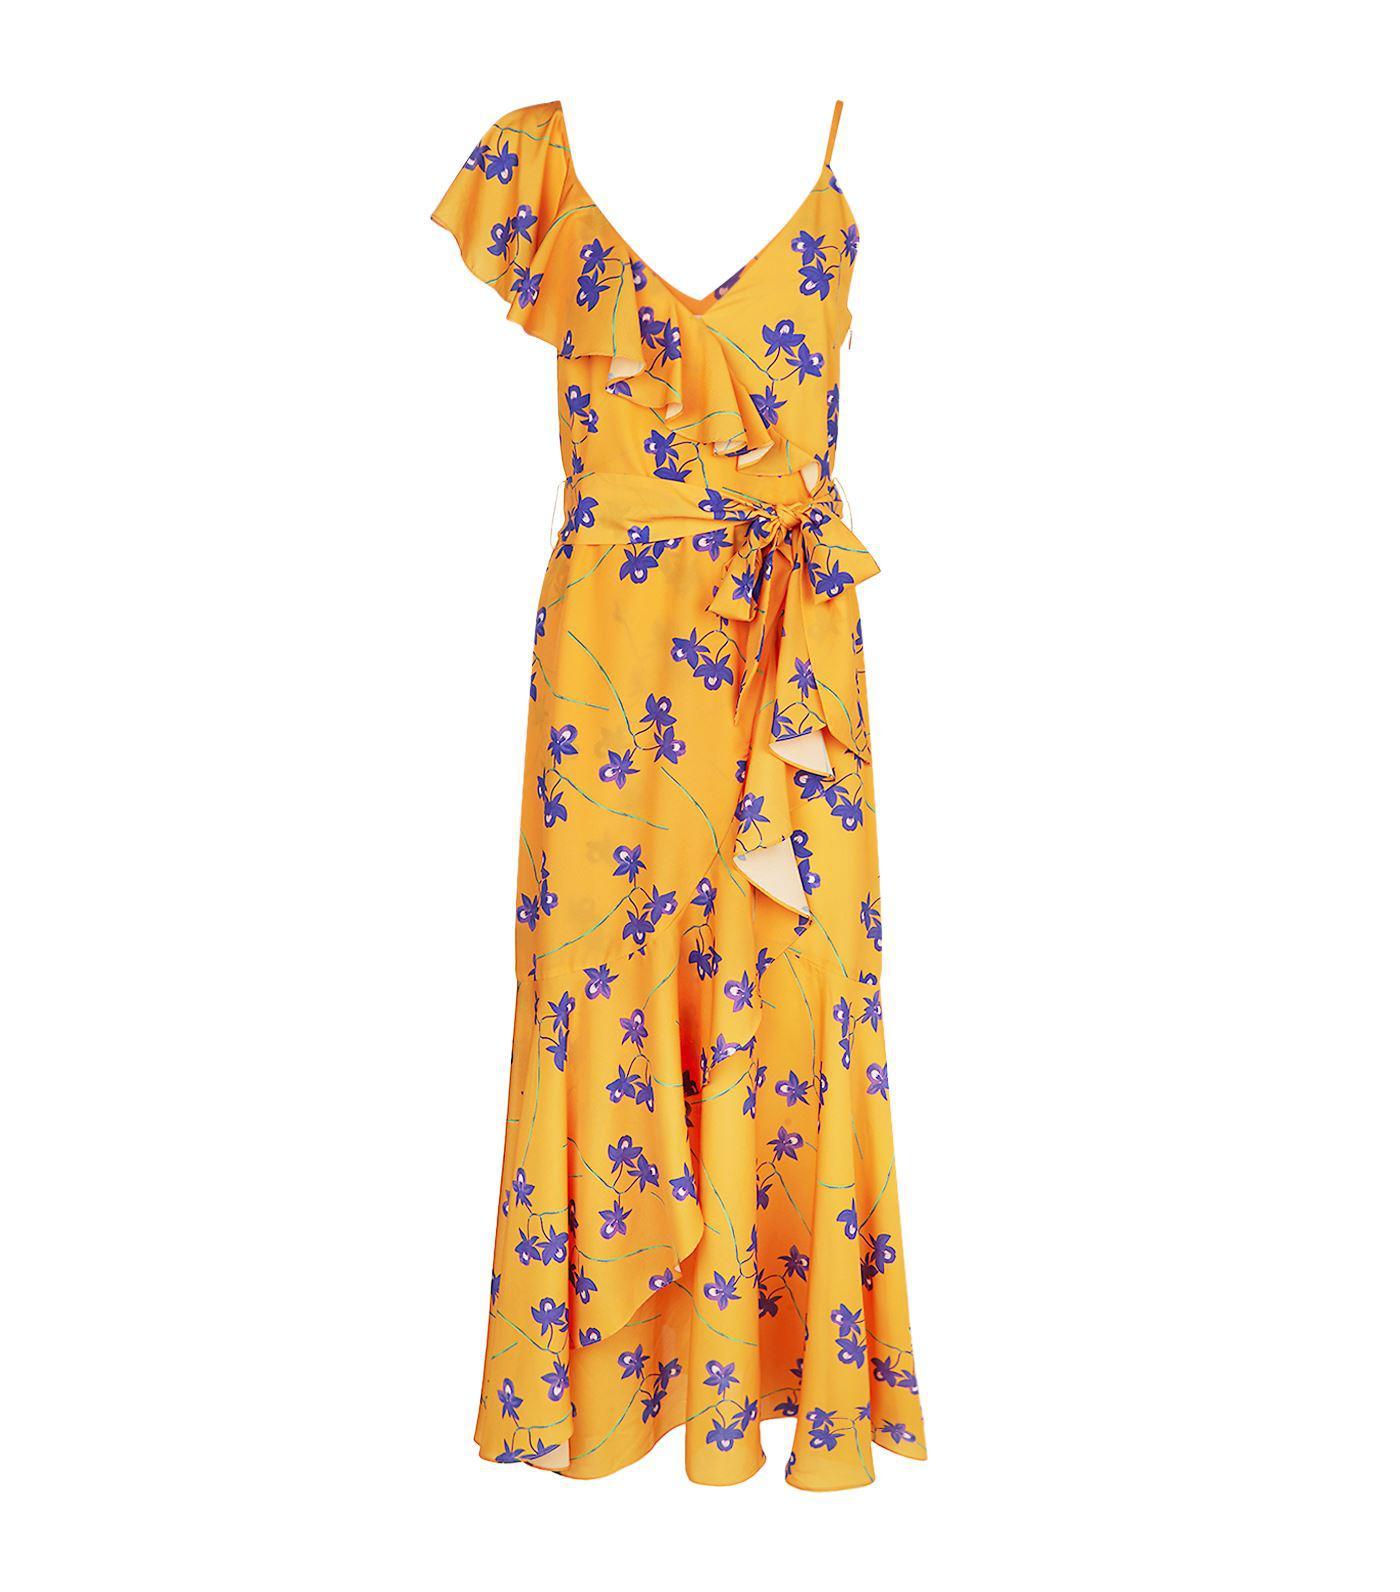 Beatrice Floral Print Maxi Dress - Yellow & Orange Borgo De Nor DflZuDj4